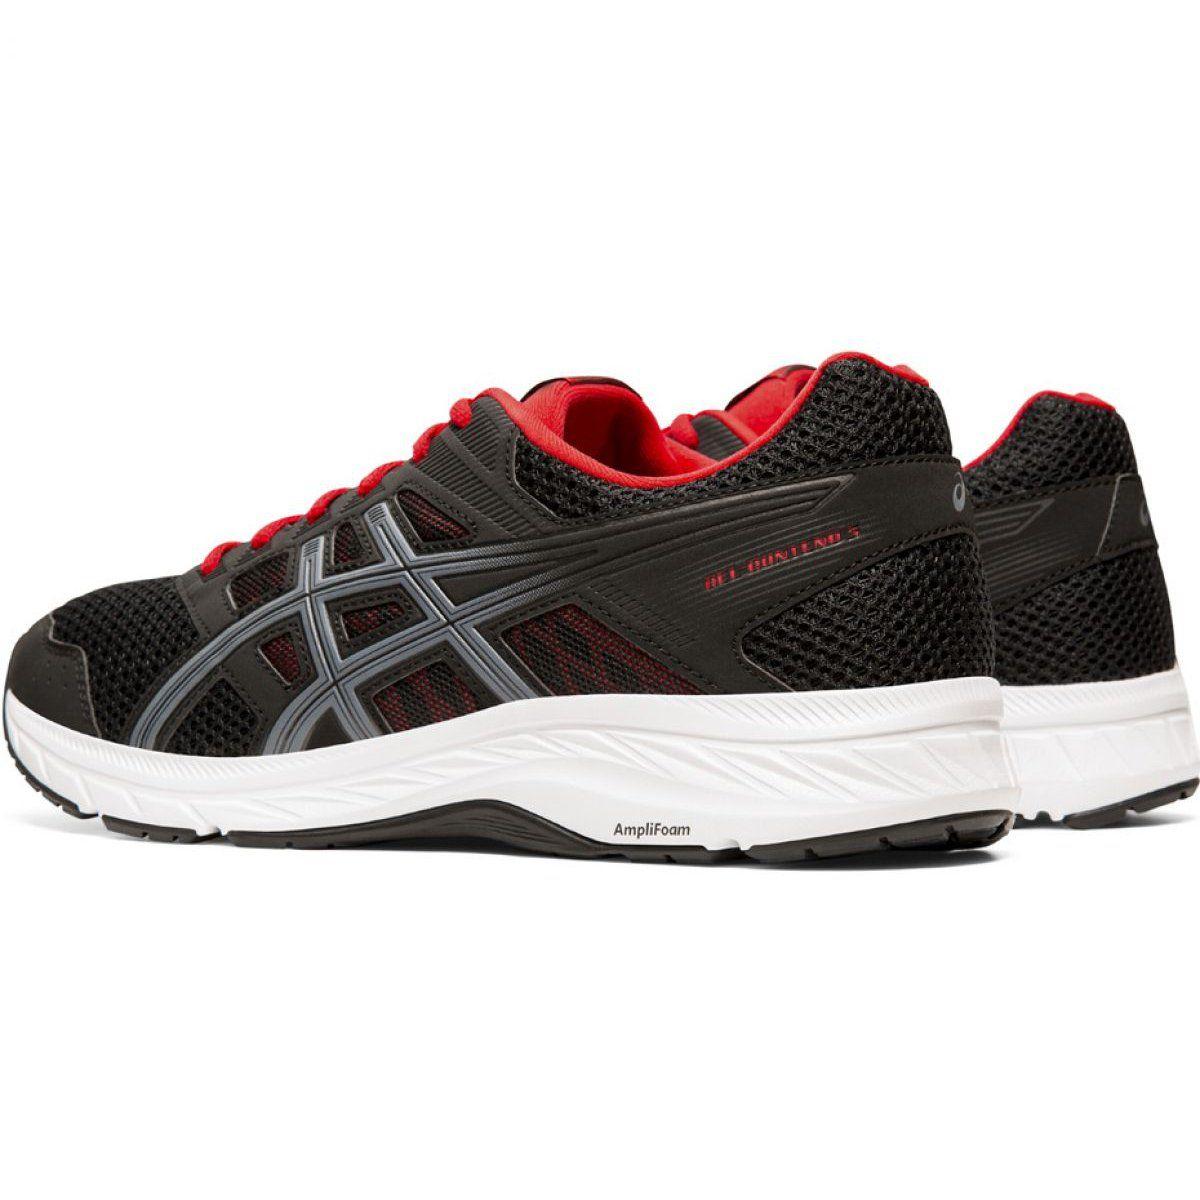 Treningowe Bieganie Sport Asics Buty Asics Gel Contend 5 M 1011a256 005 Czarno Czerwone Black And Red Shoes Comfortable Shoes